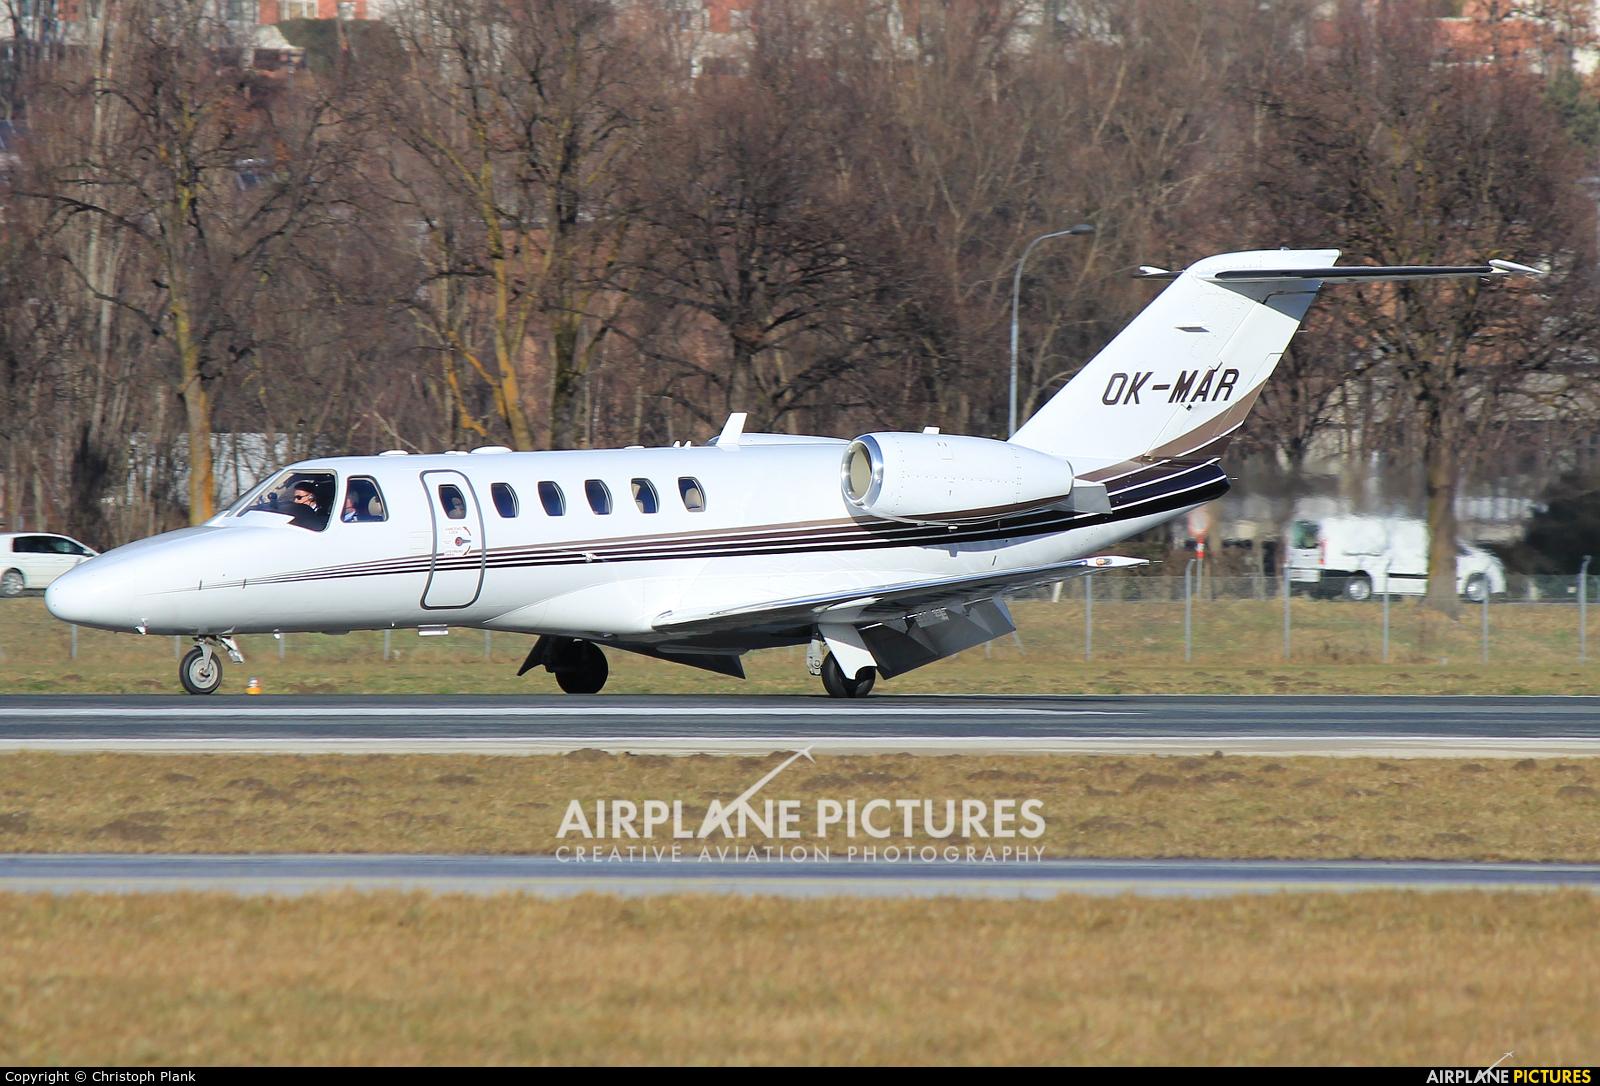 Private OK-MAR aircraft at Innsbruck